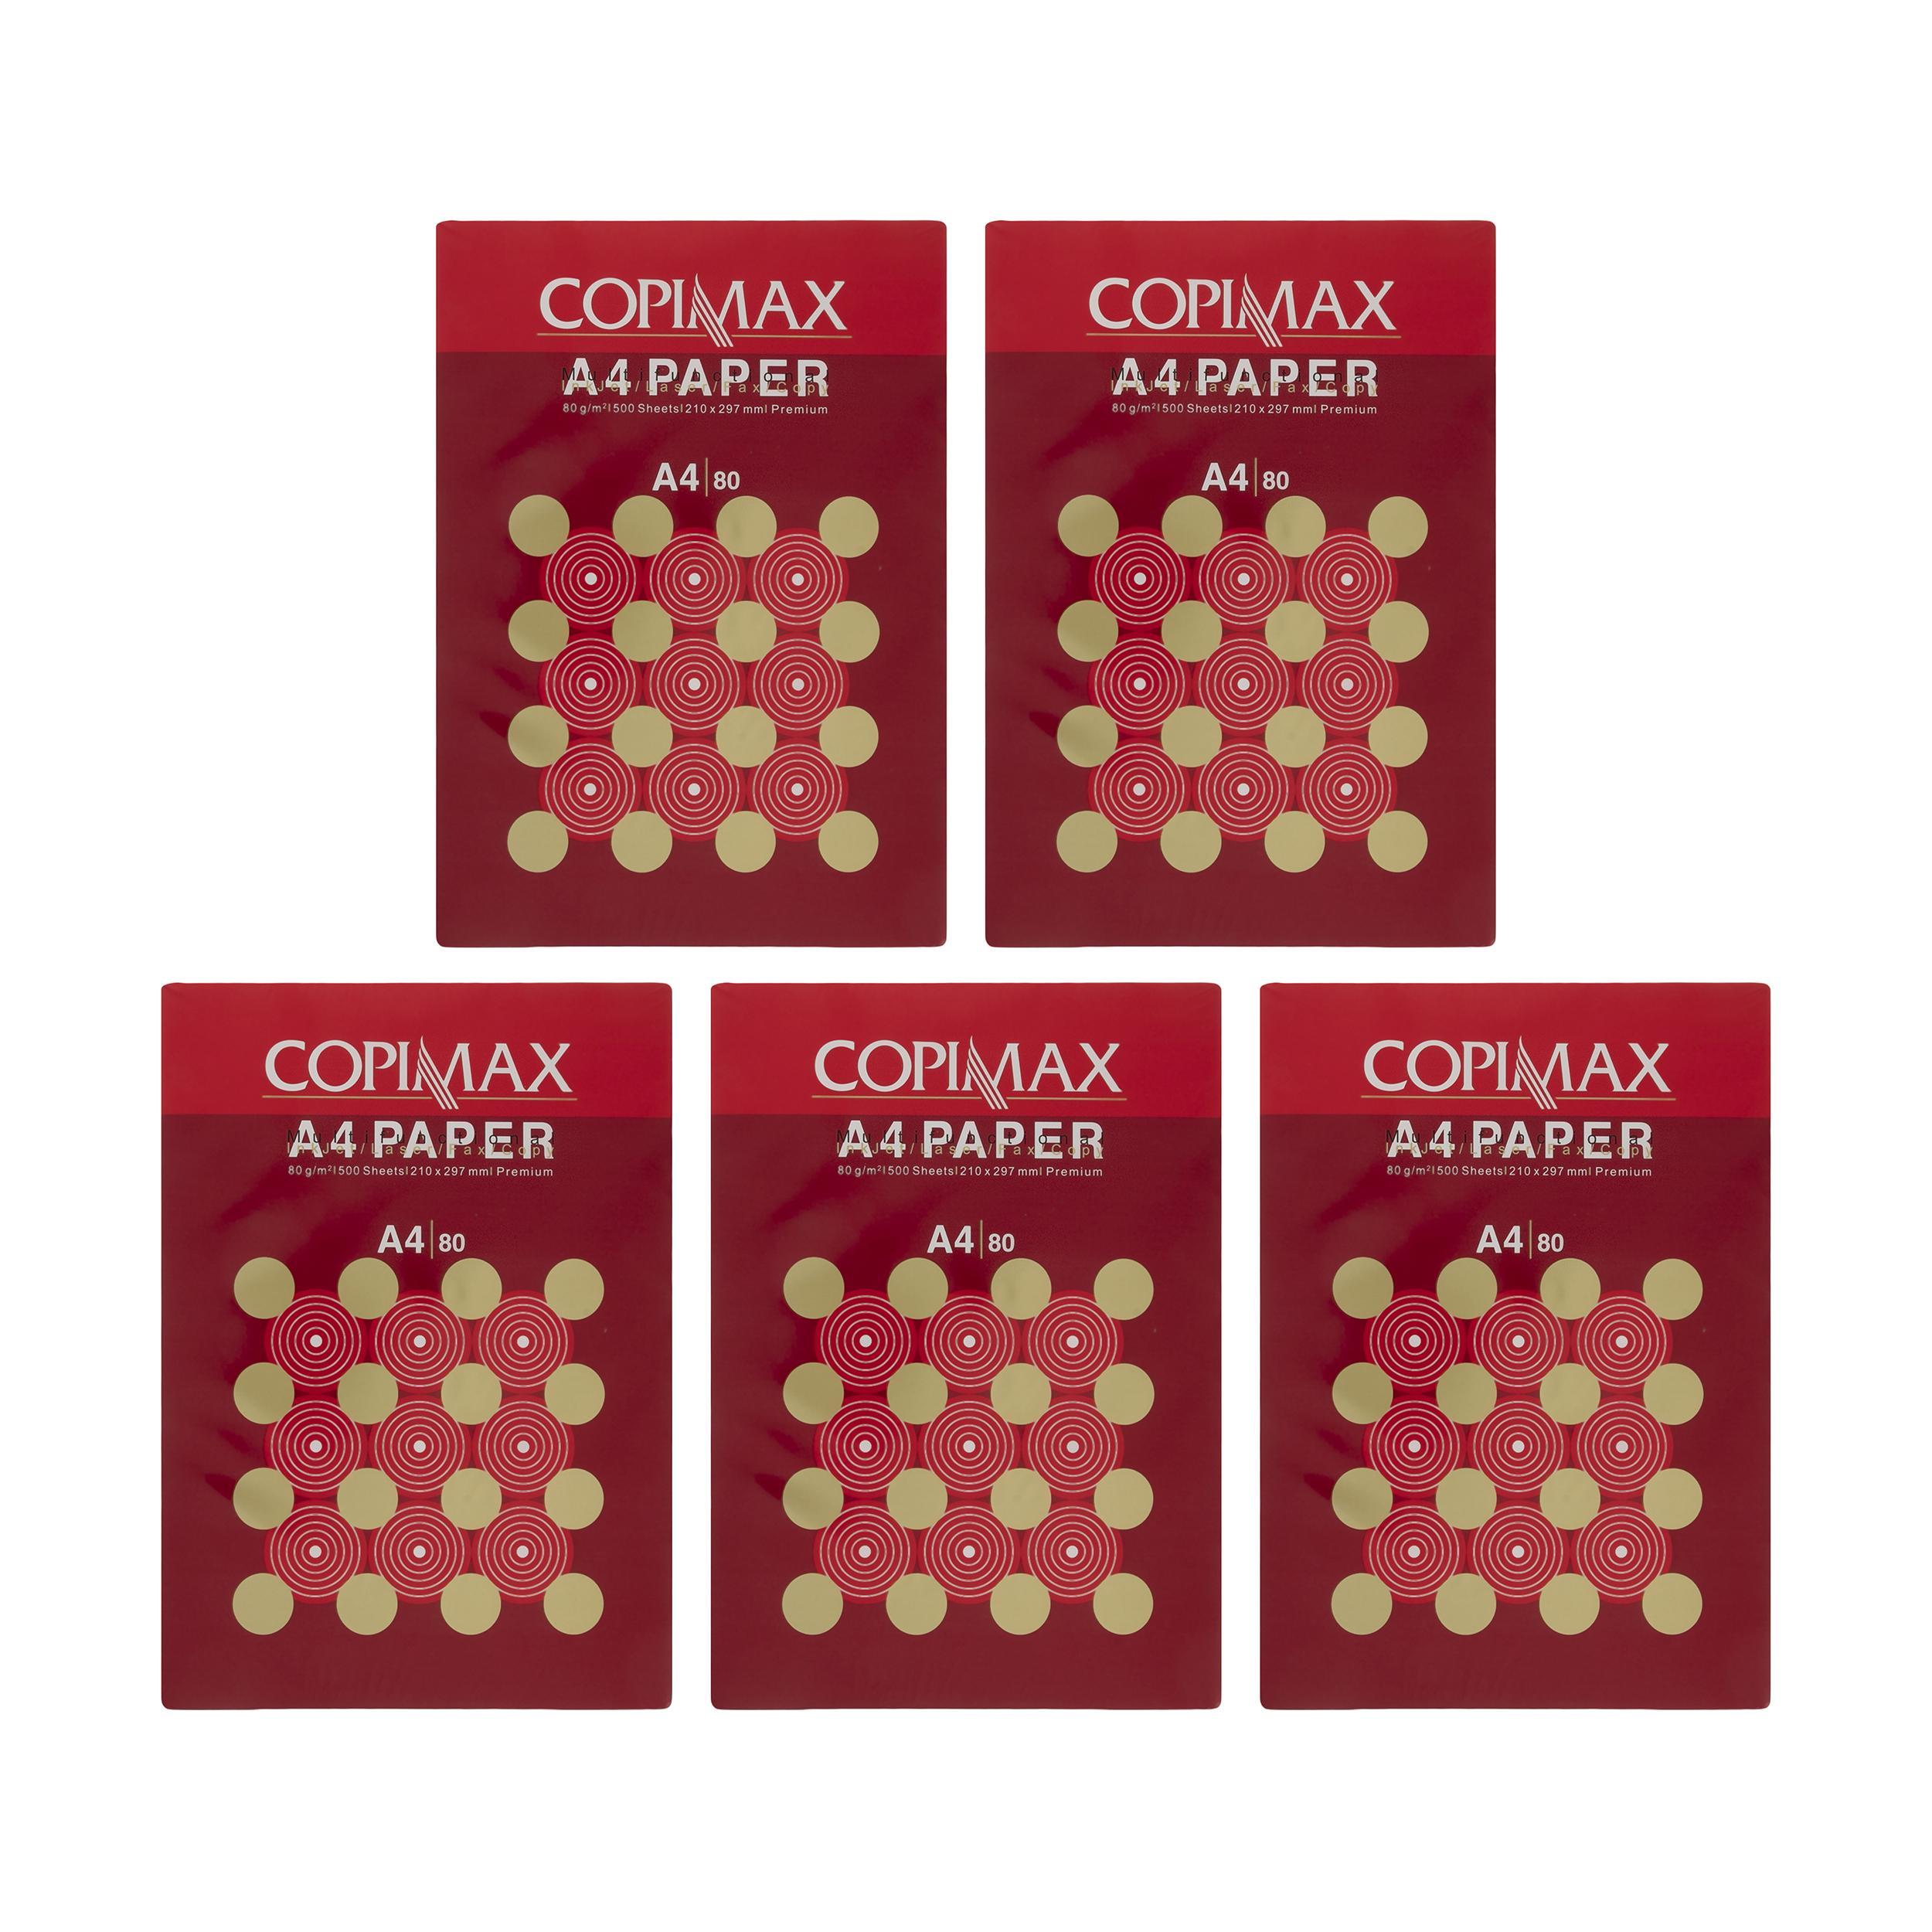 کاغذ A4 کپی مکس مدل Premium بسته 2500 عددی